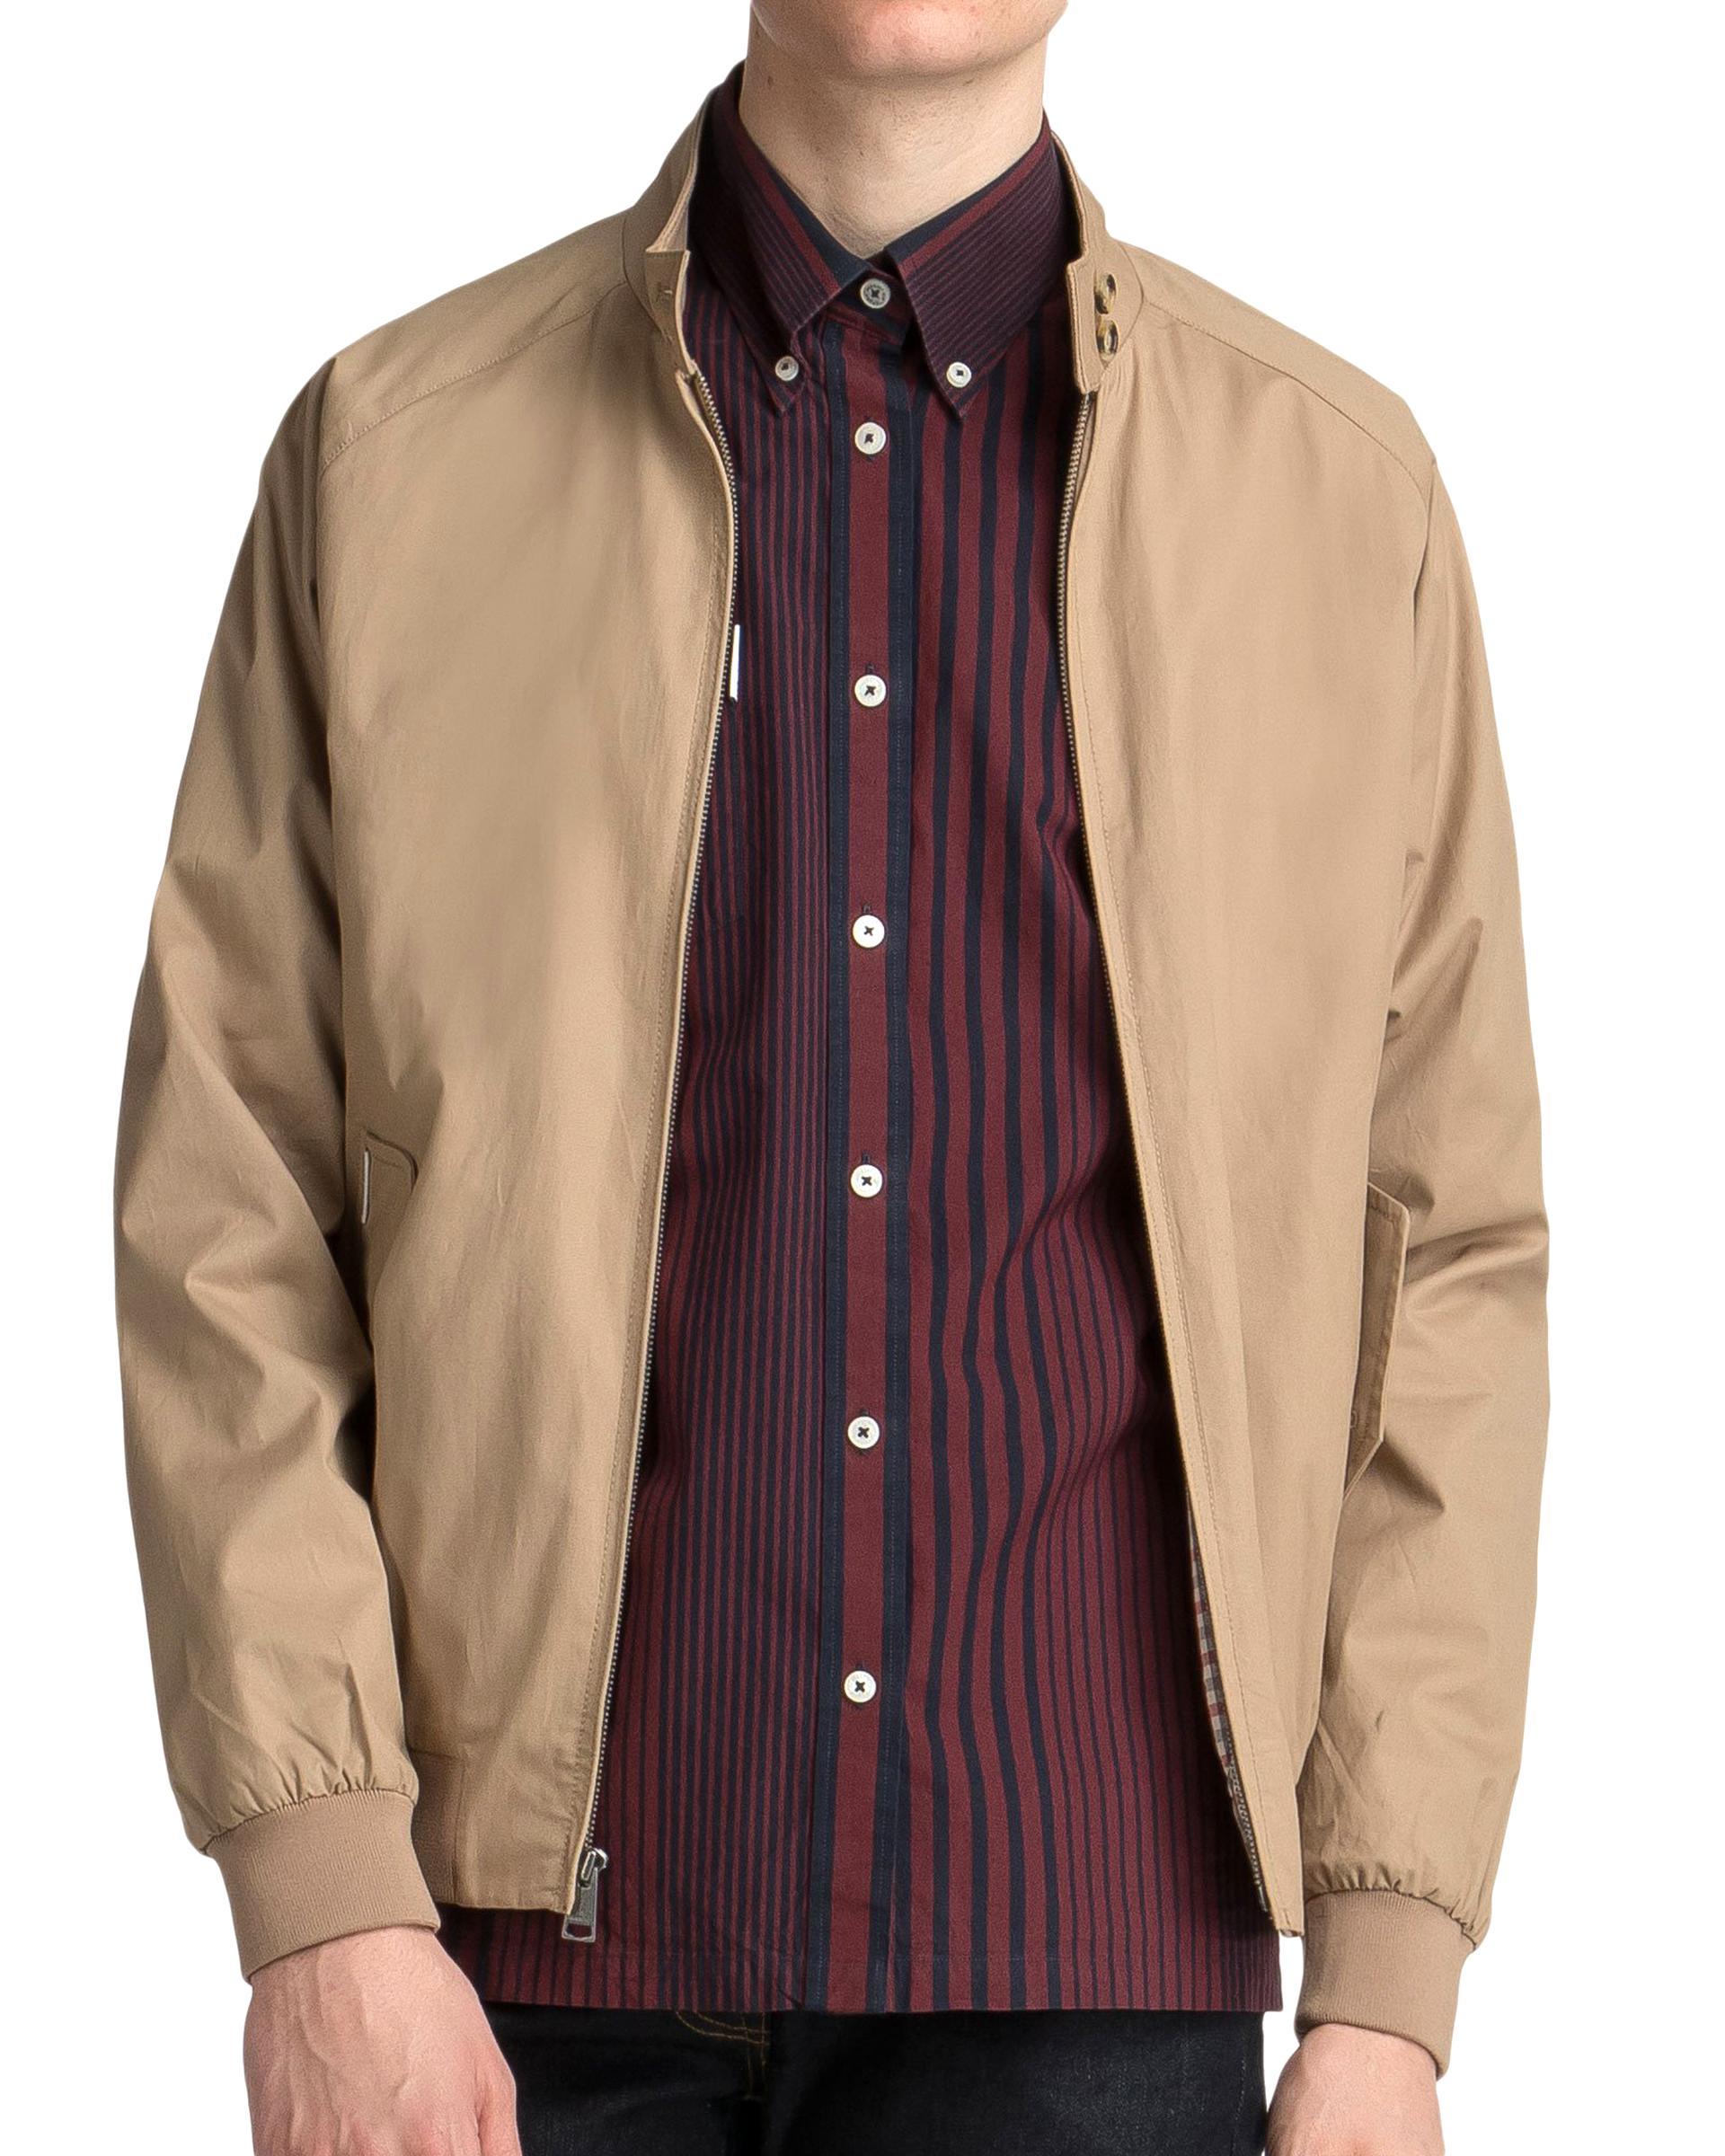 Superdry Men's Montauk Harrington Jacket, Beige, XXL: Amazon